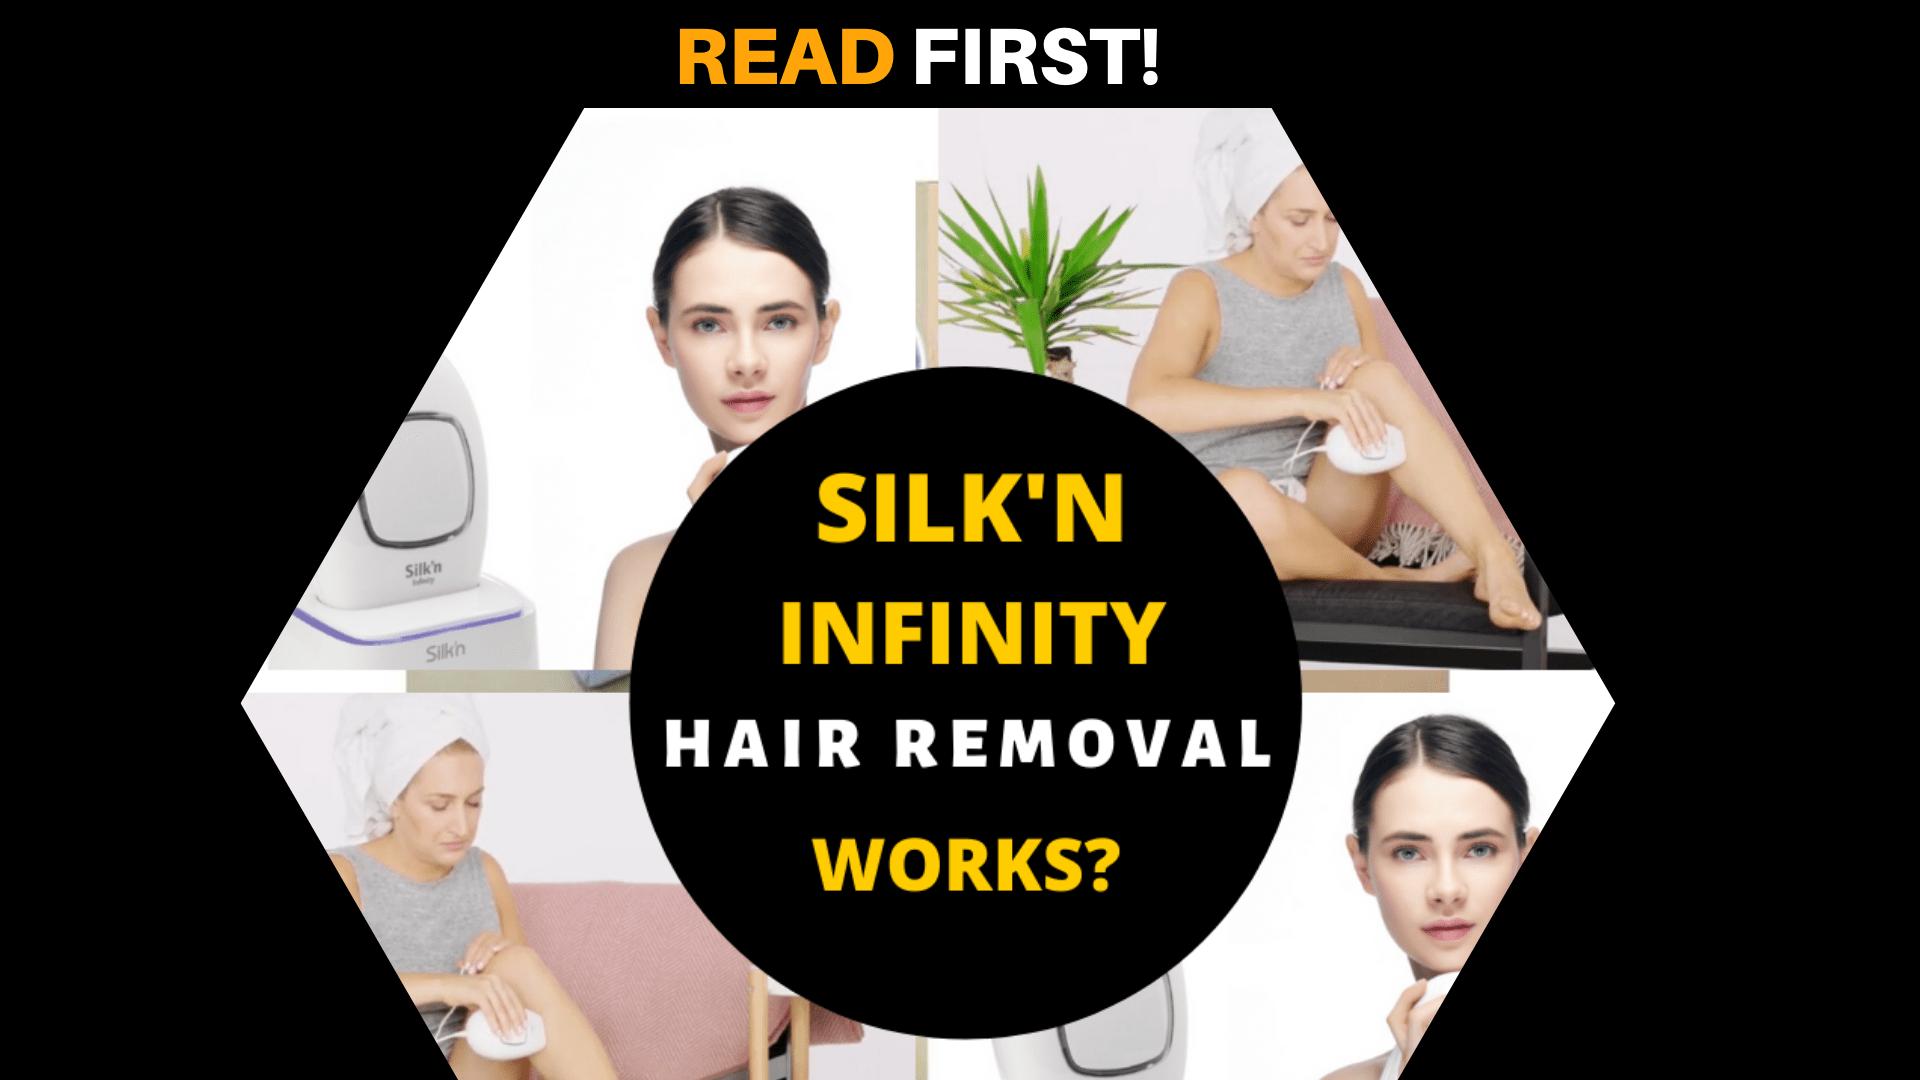 Silk'n Infinity Hair Removal Device